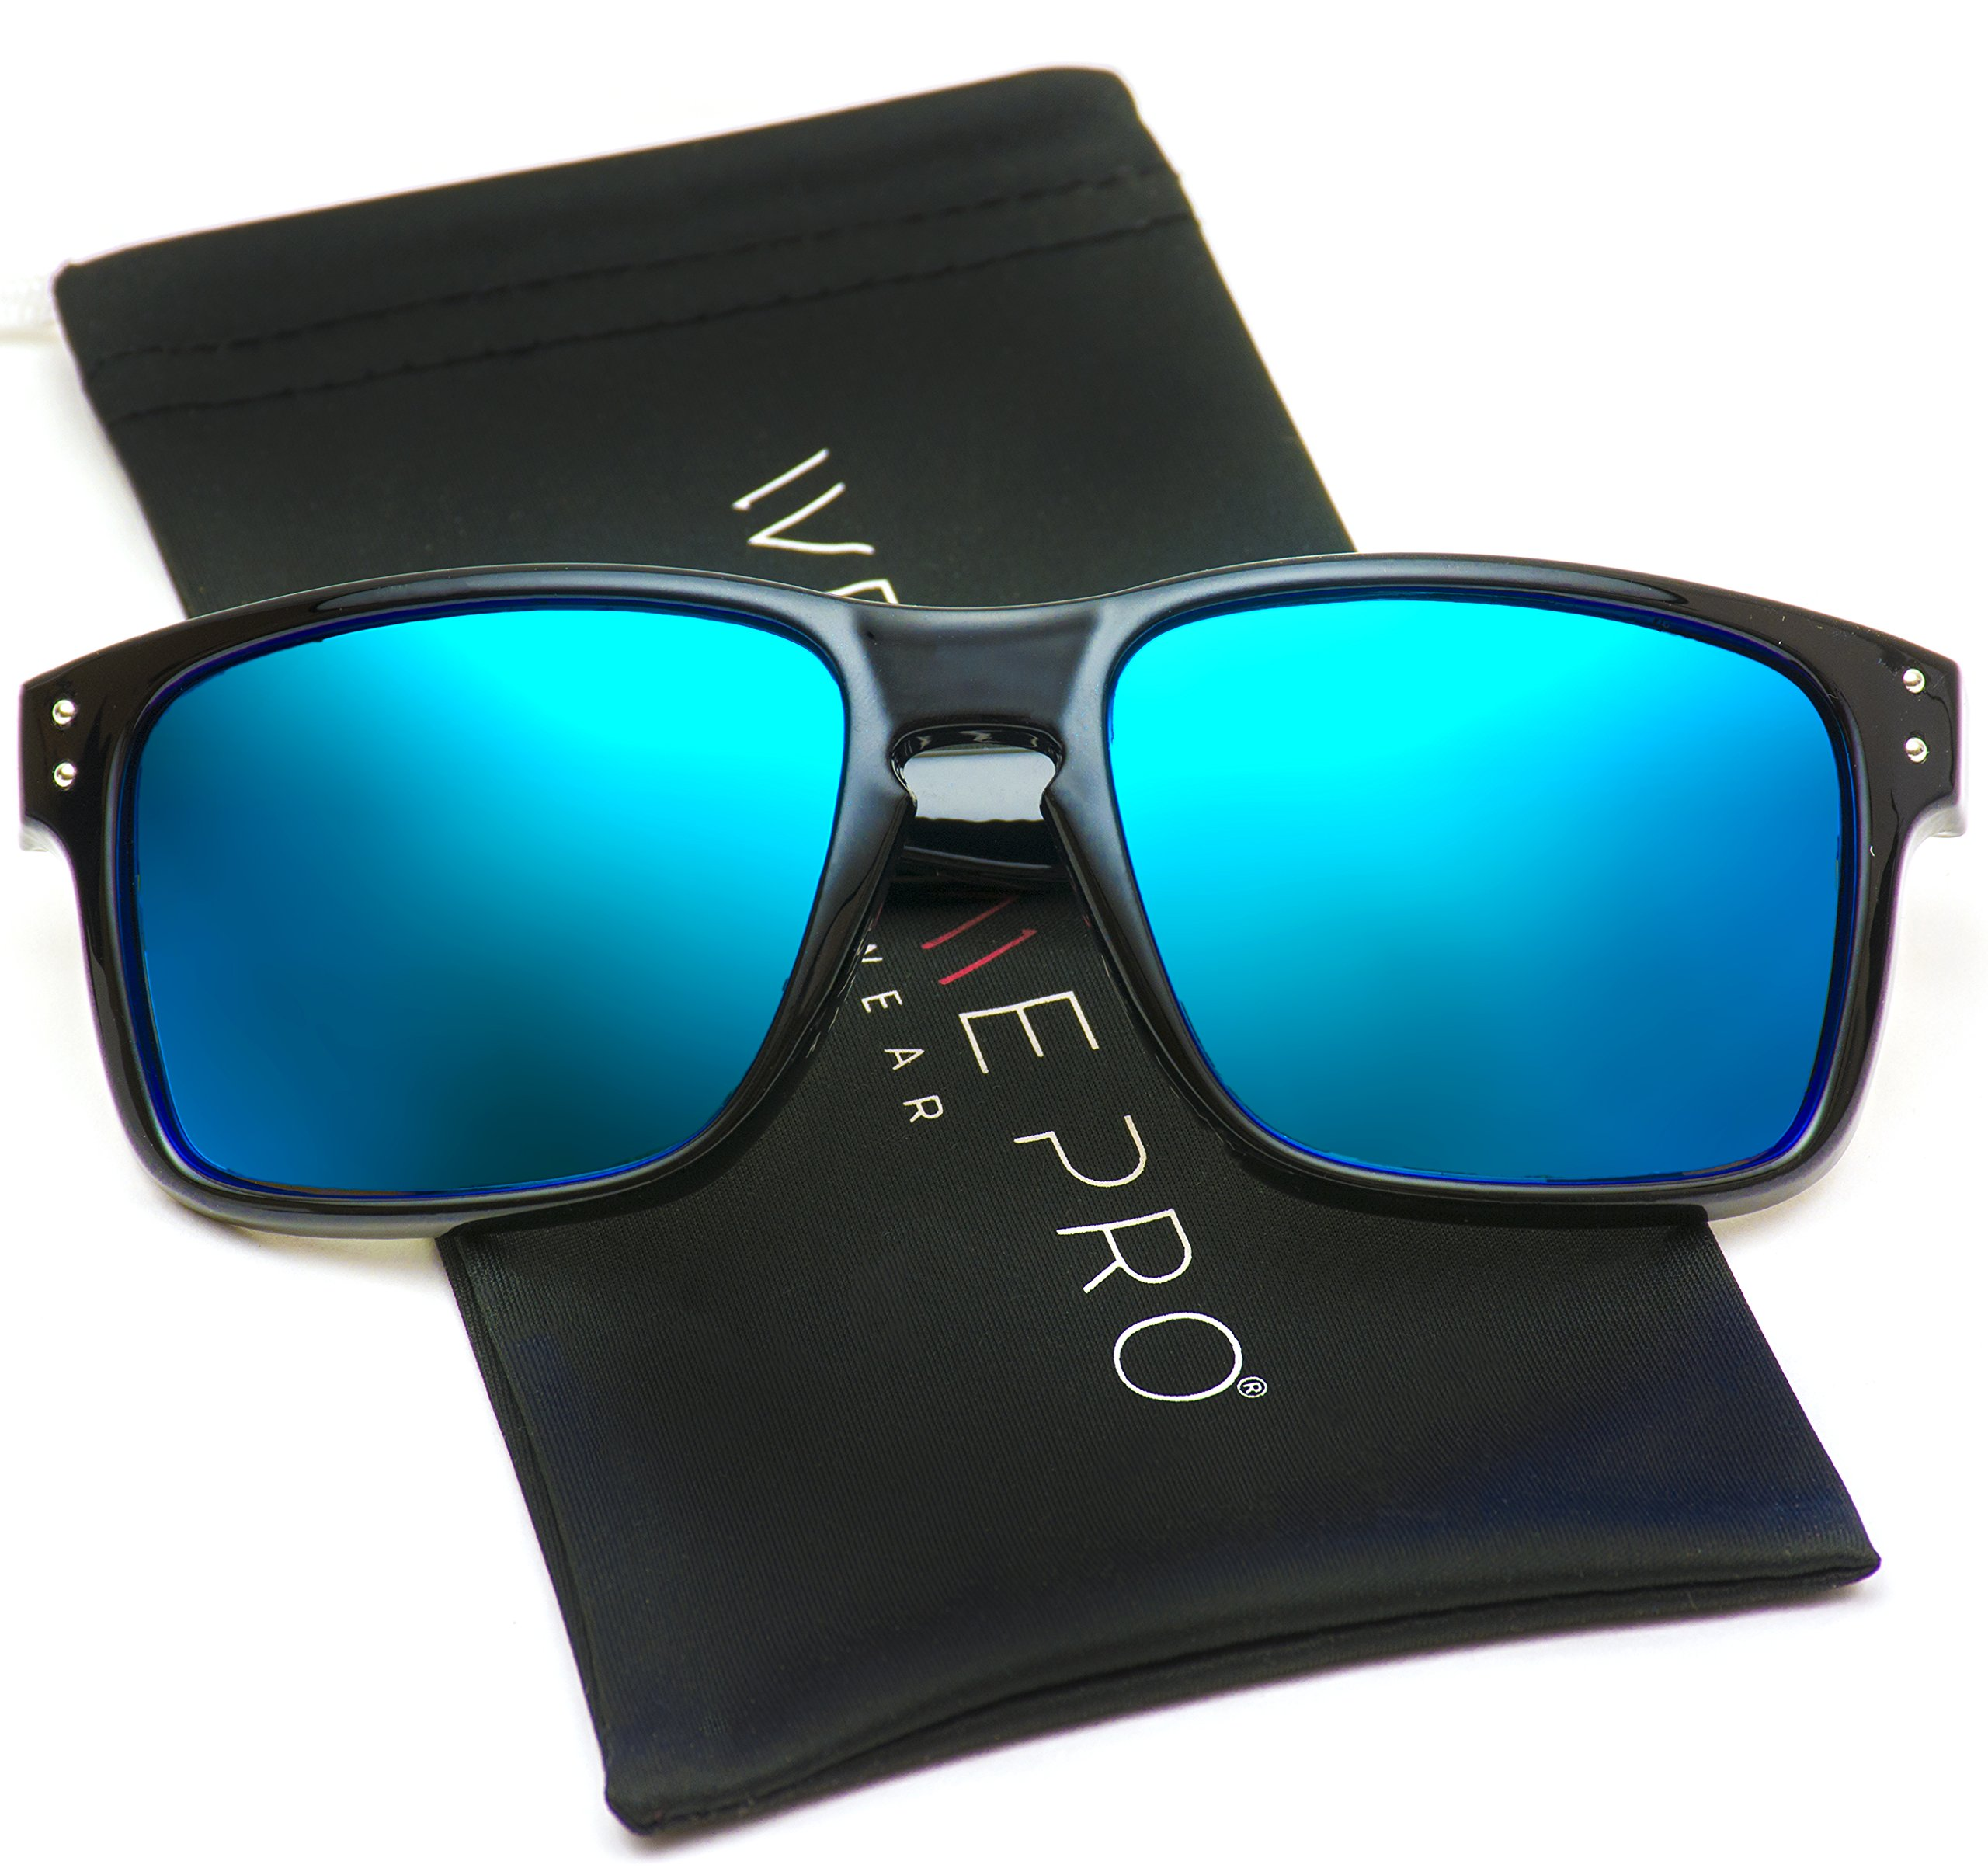 WearMe Pro - Premium Polarized Mirror Lens Classic Wayfarer Style Sunglasses